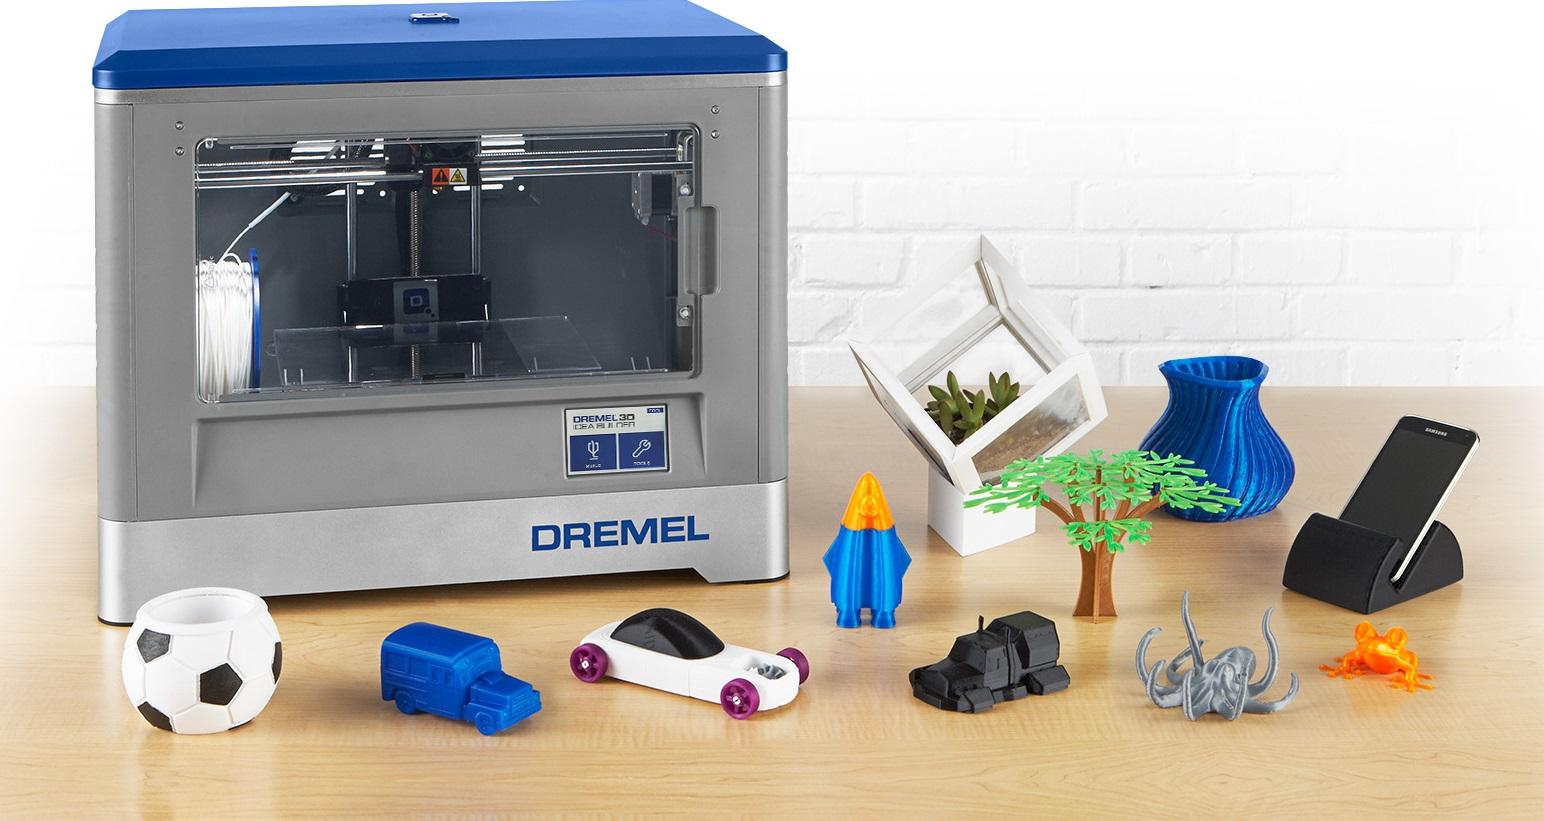 printer 3D price